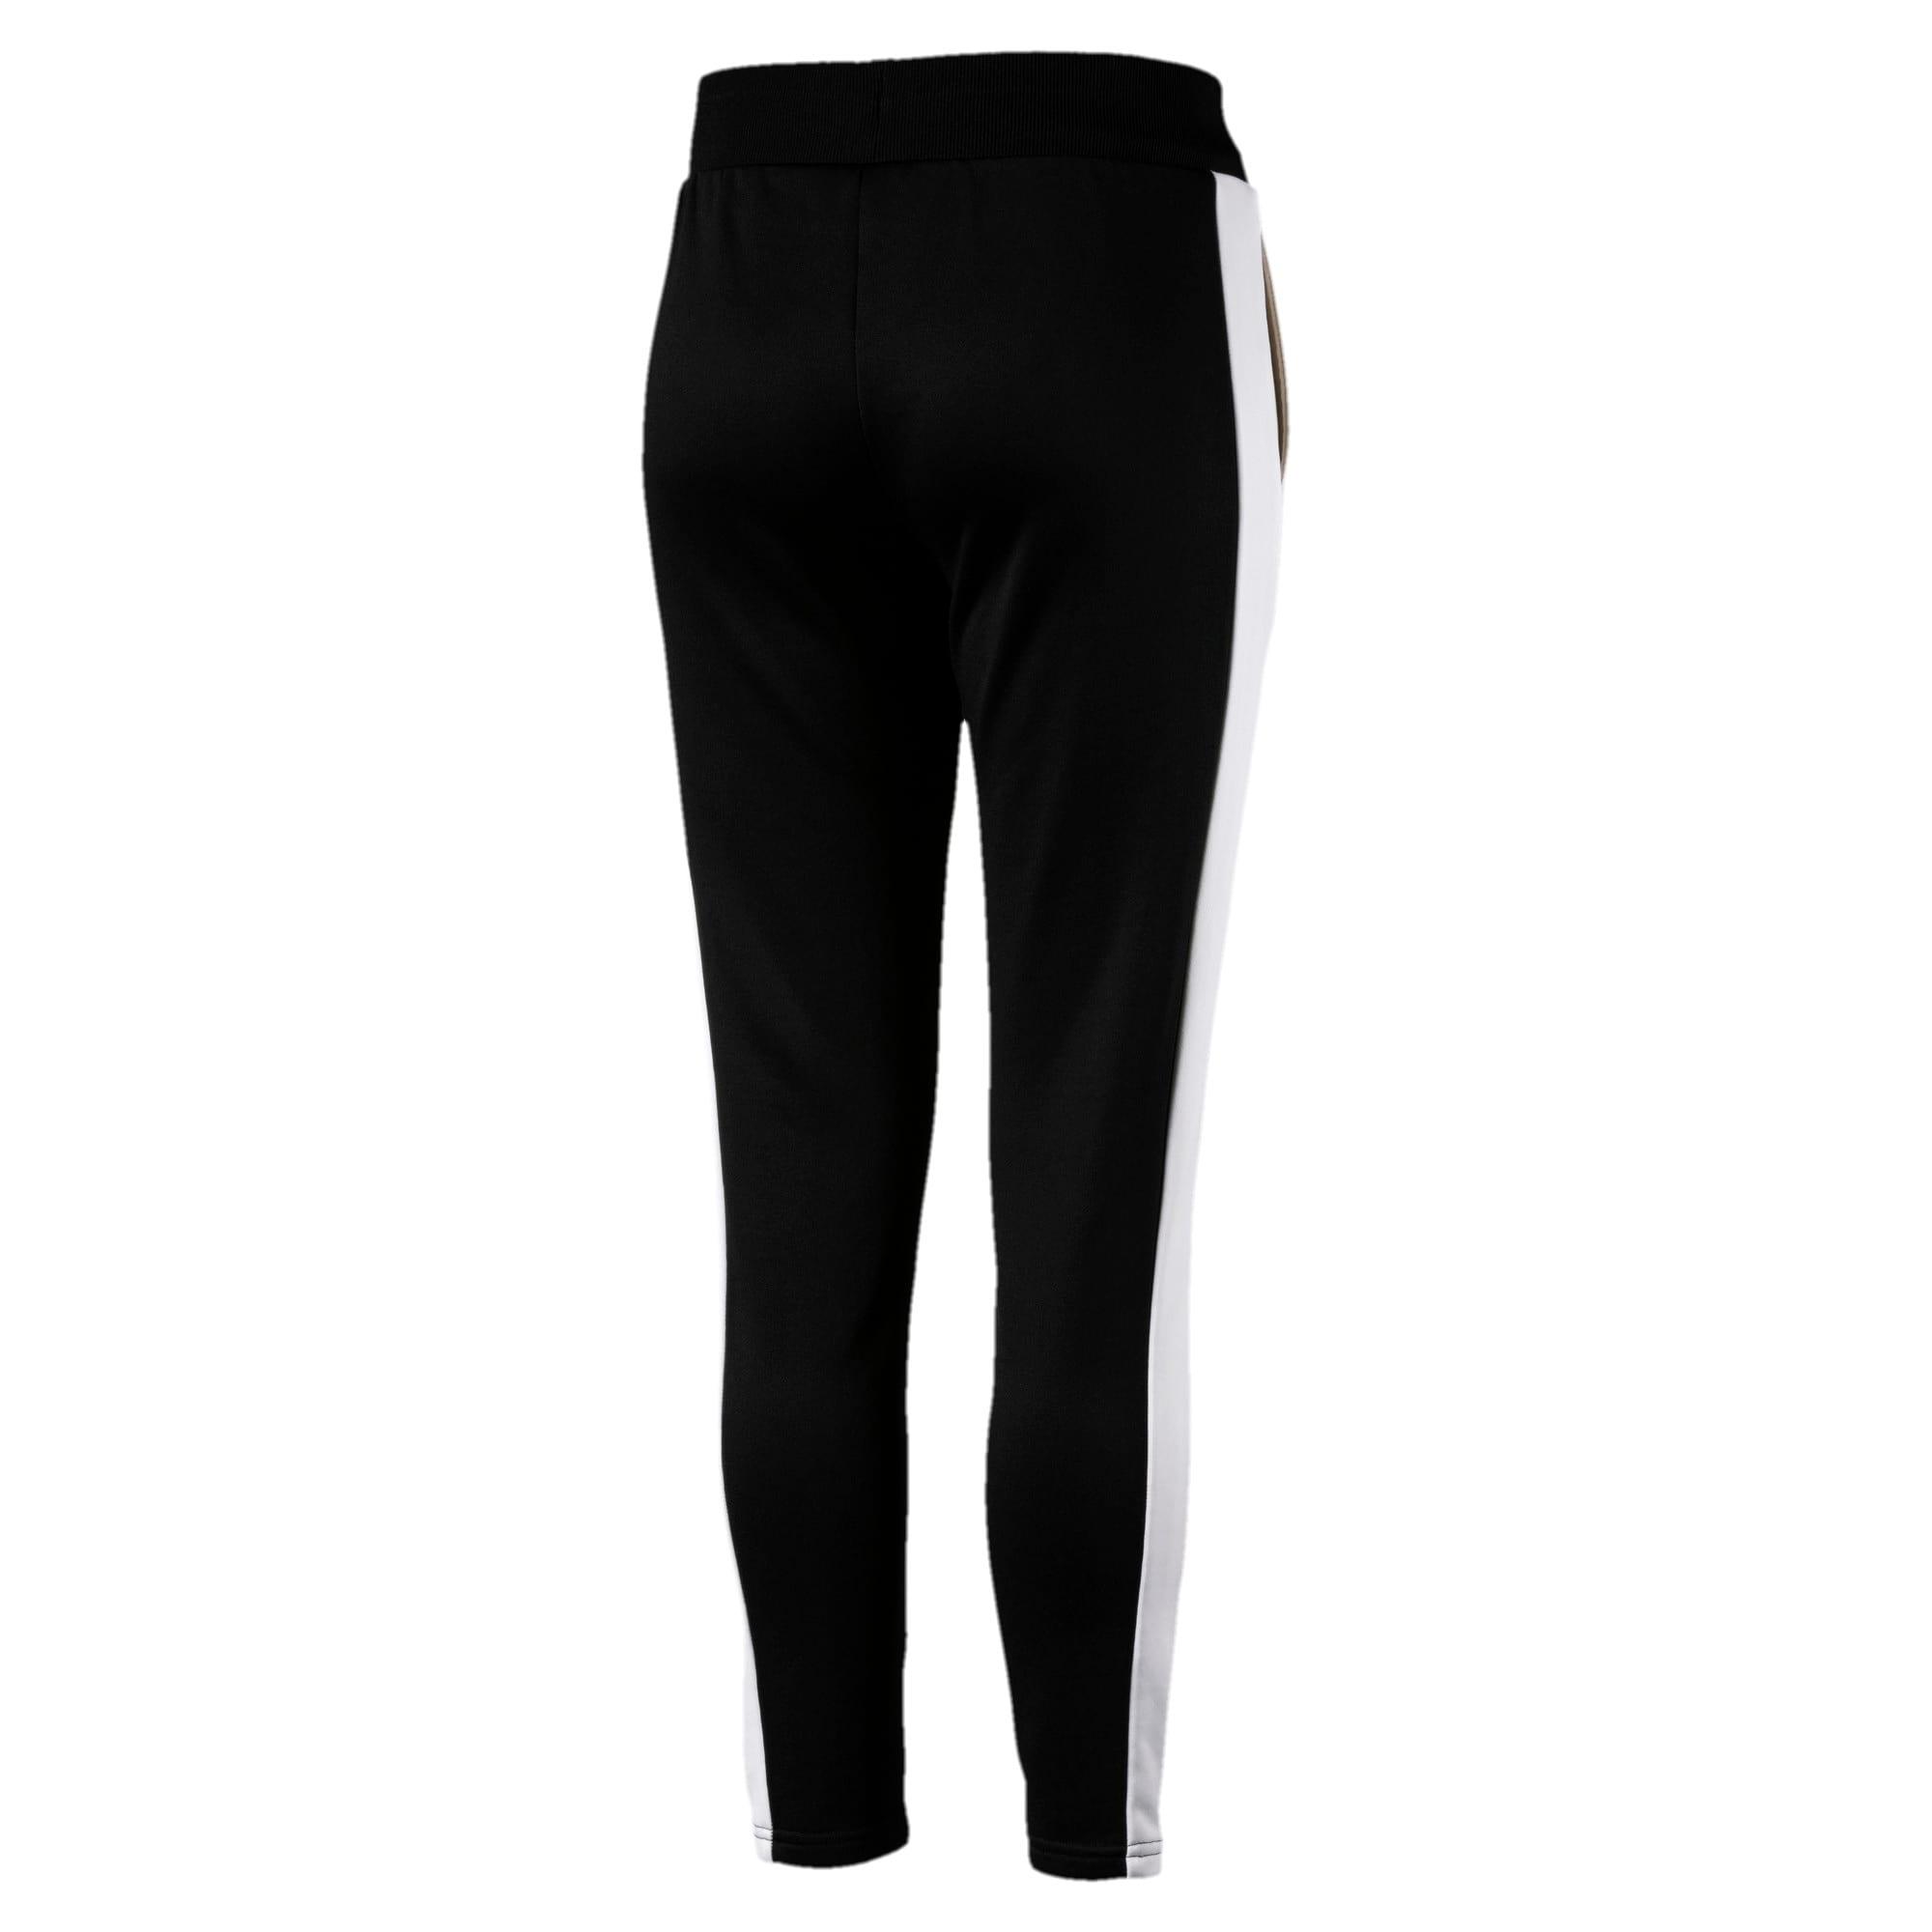 Thumbnail 3 of Retro Women's Track Pants, Puma Black, medium